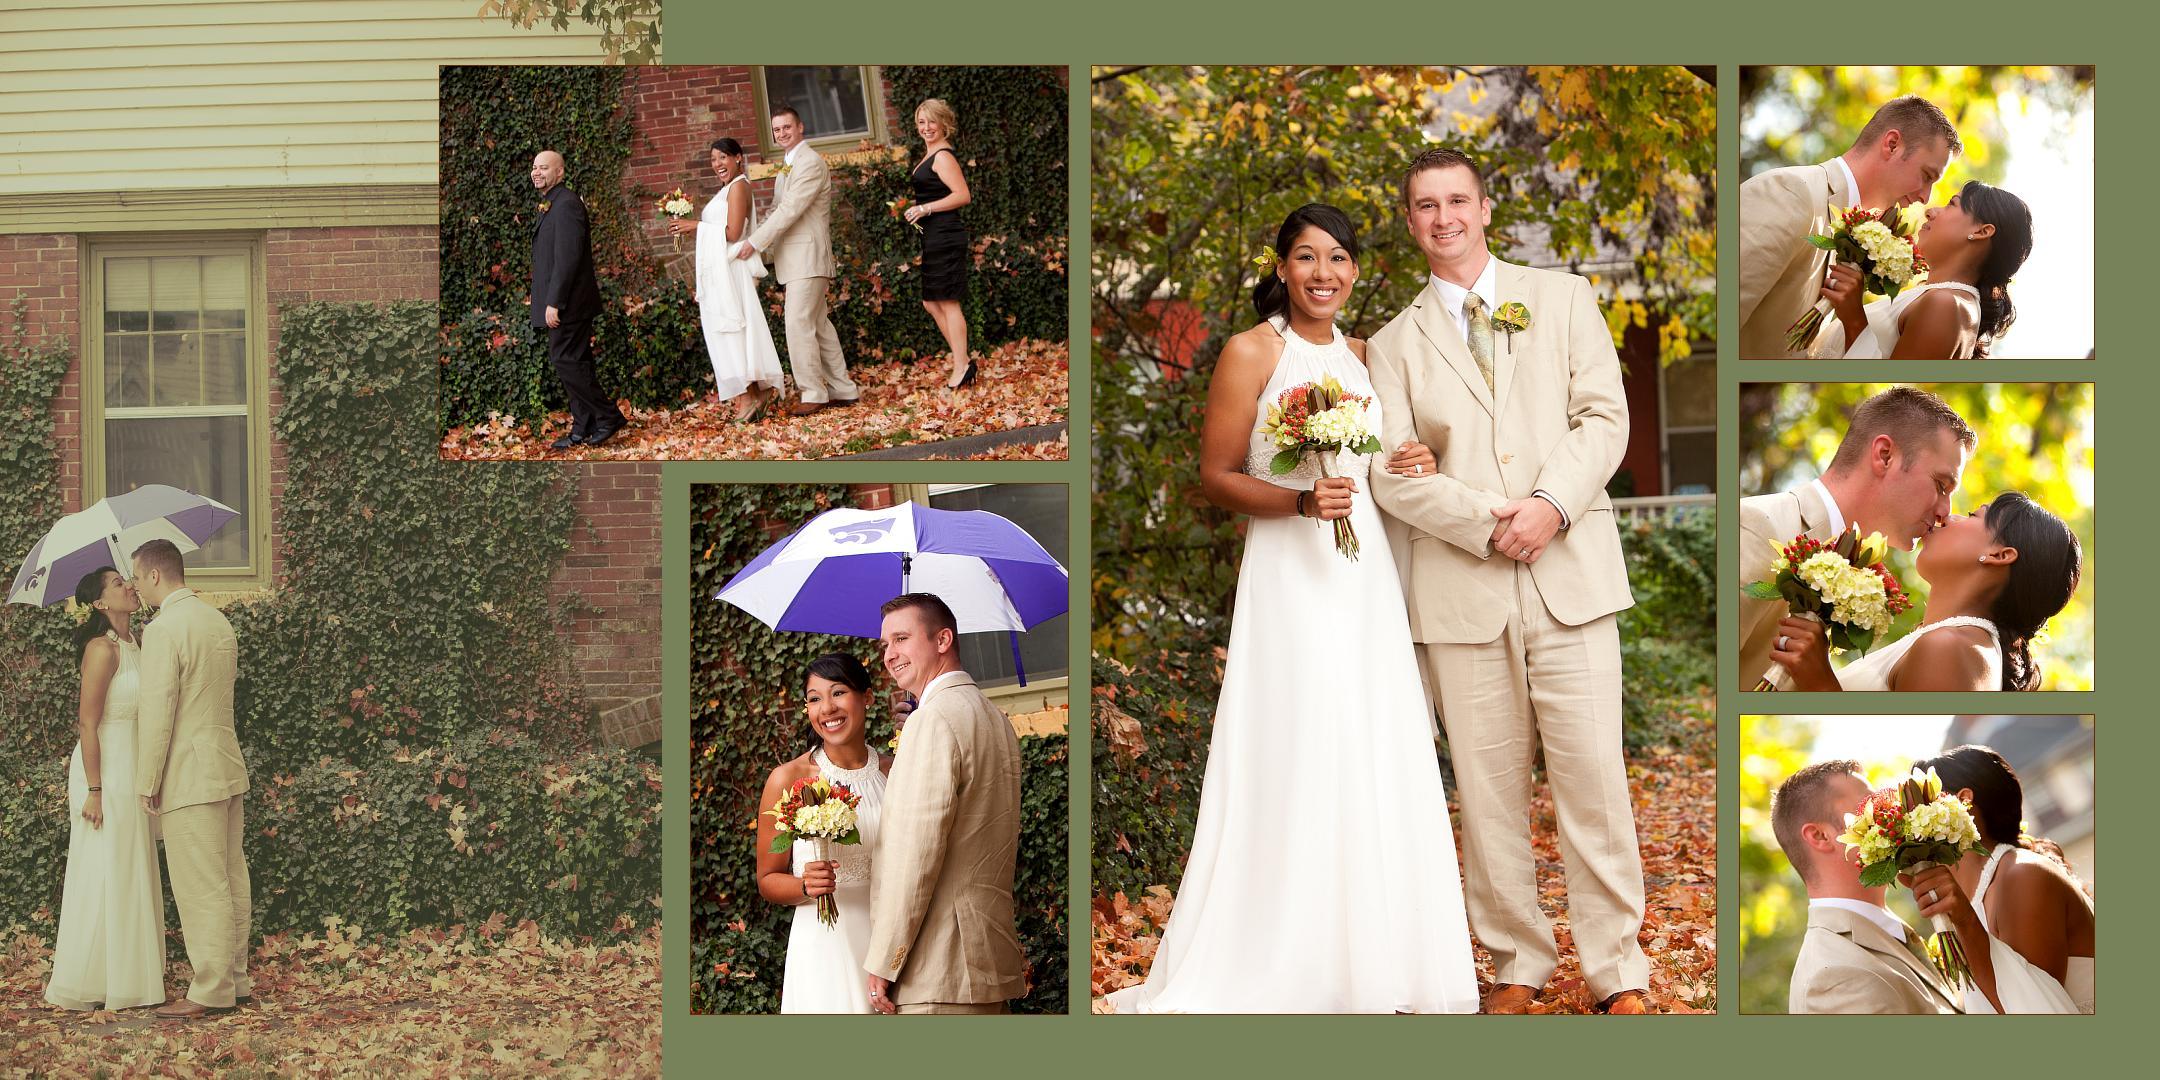 Wedding Photos by Tom Schmidt Chicago (35)